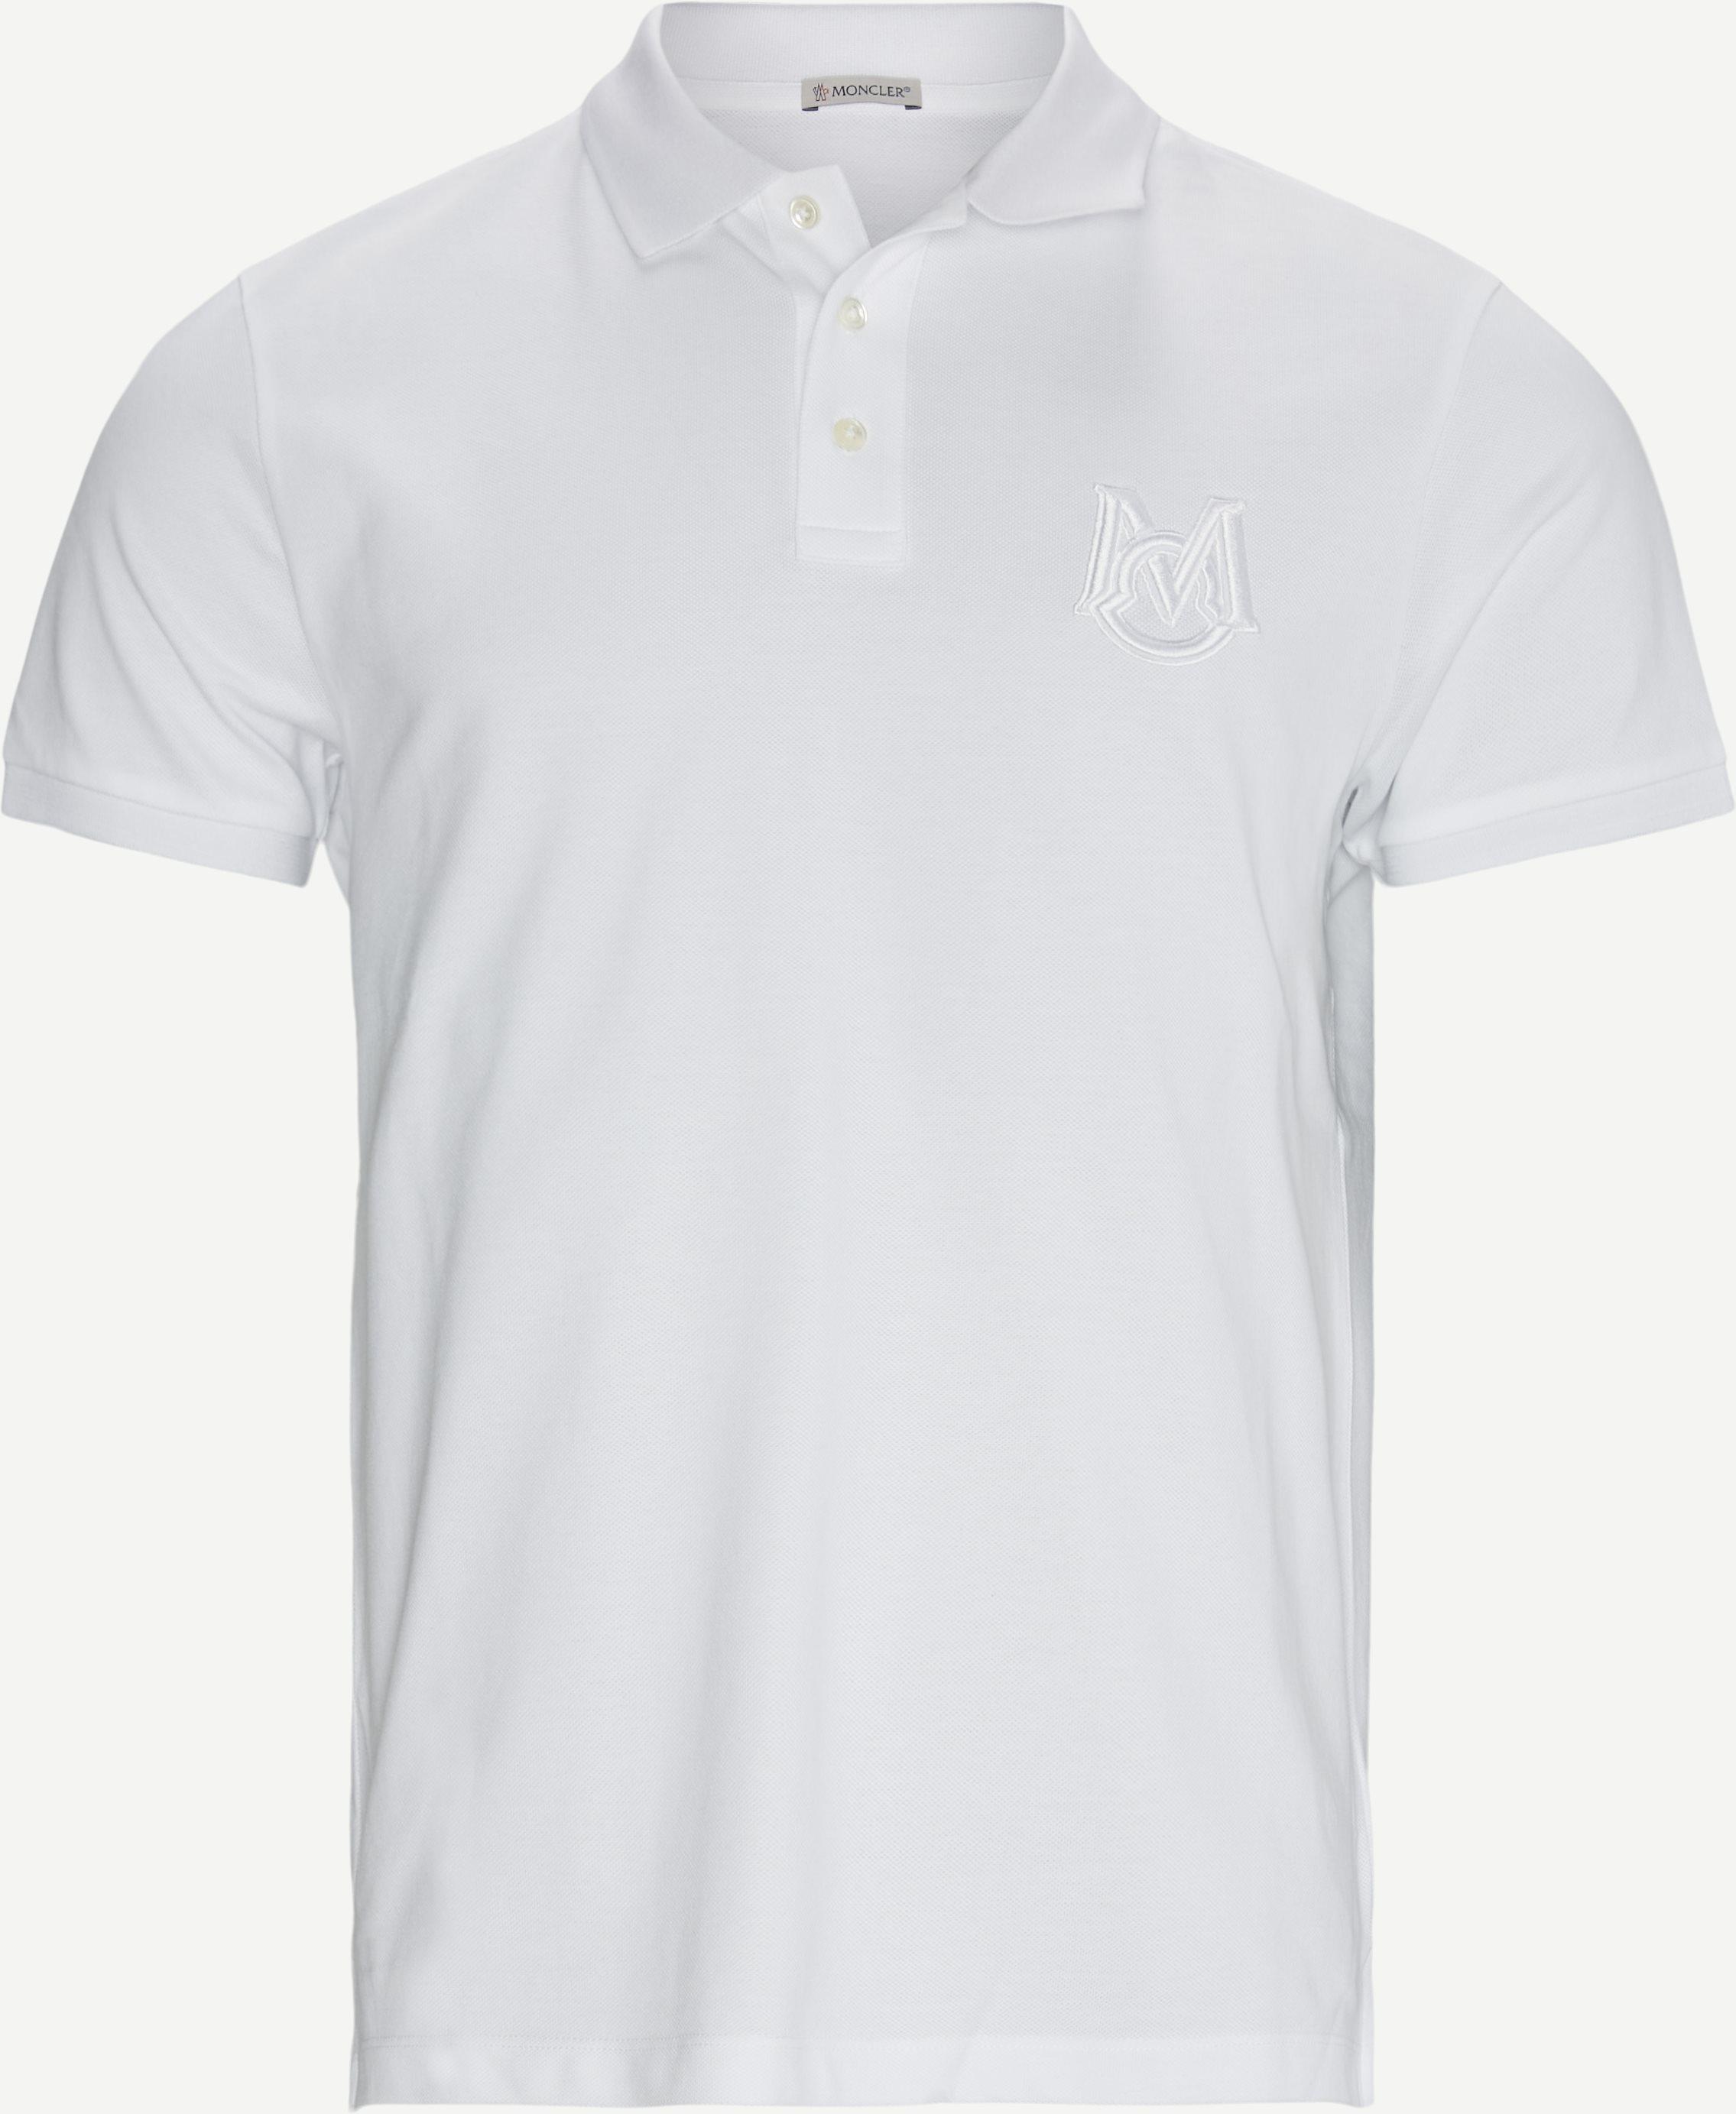 Polo Manica C T-shirt - T-shirts - Regular - Vit